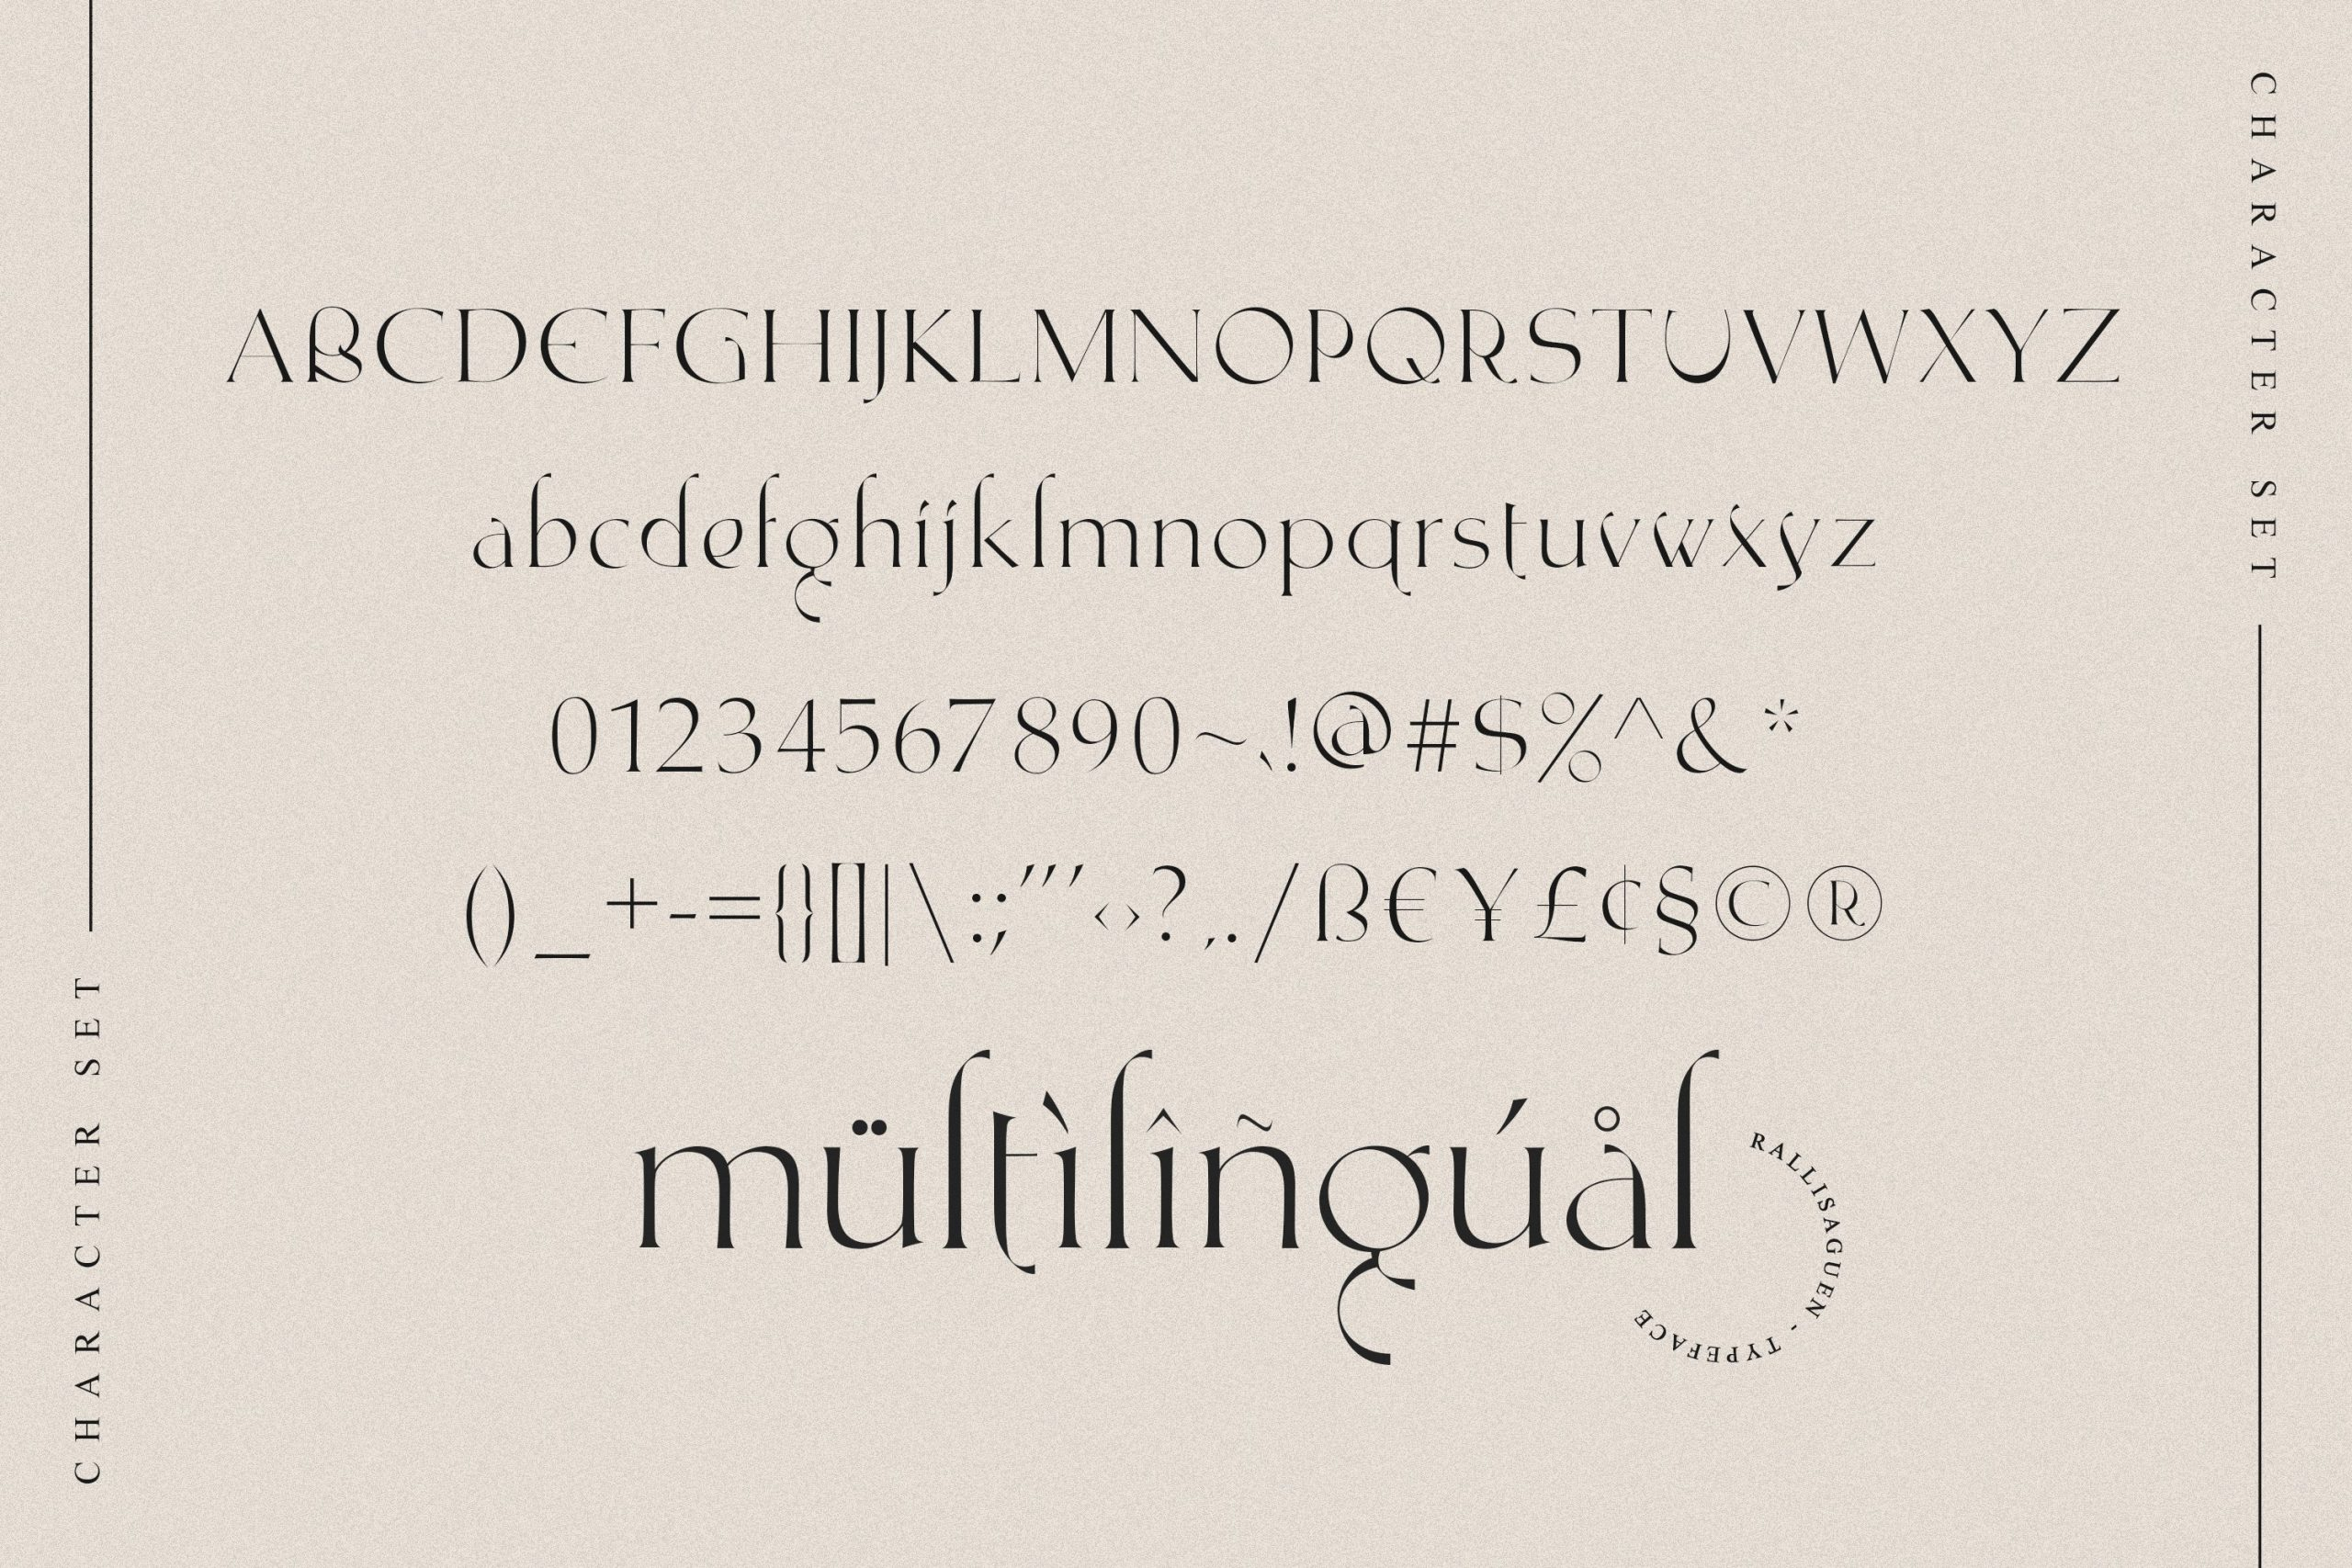 RallisaguenModern Serif Typeface -3